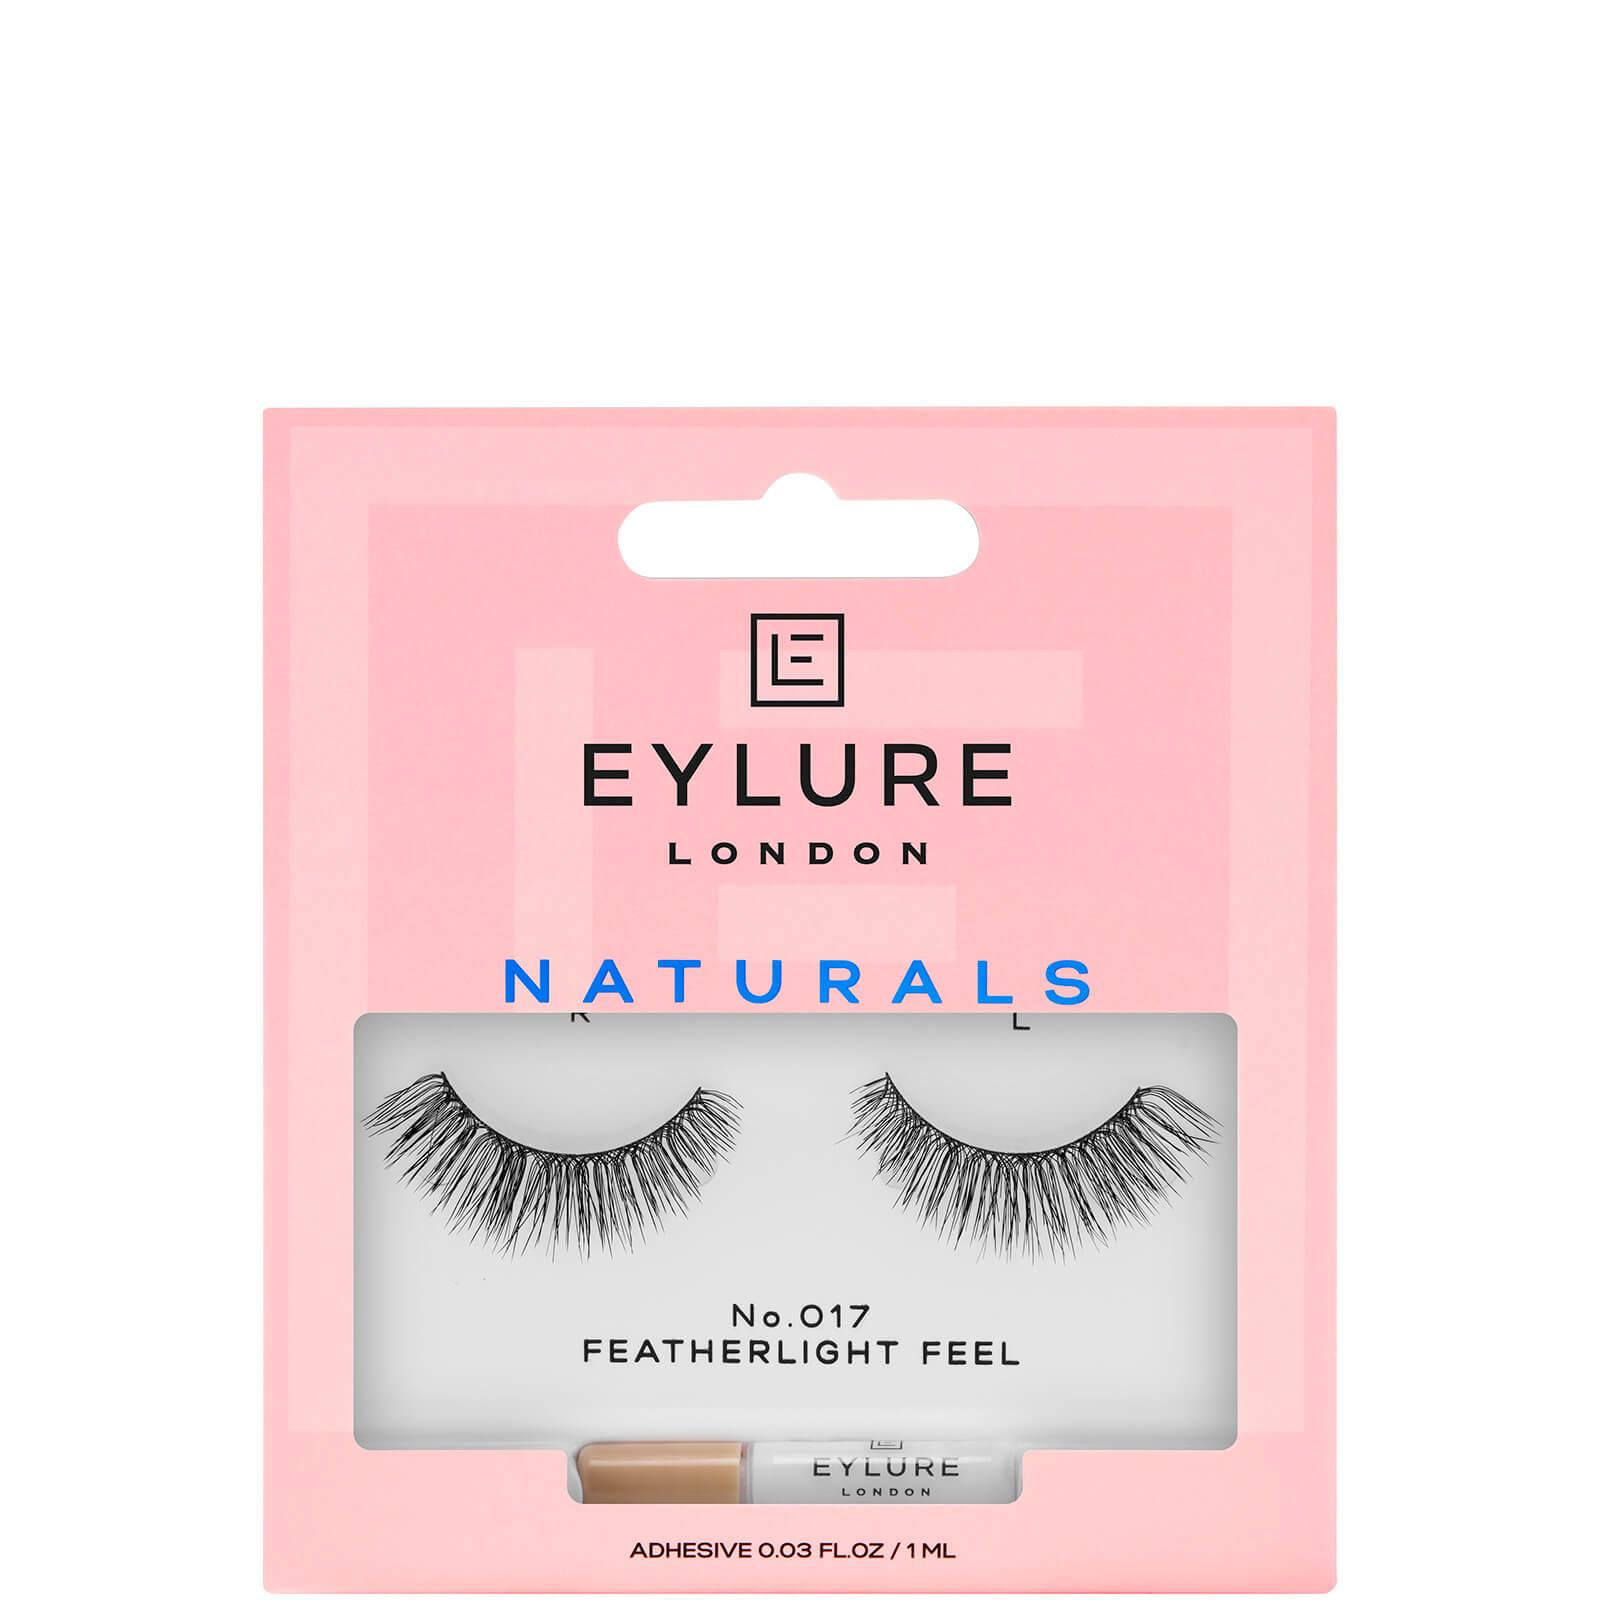 Eylure Naturals 017 Lashes